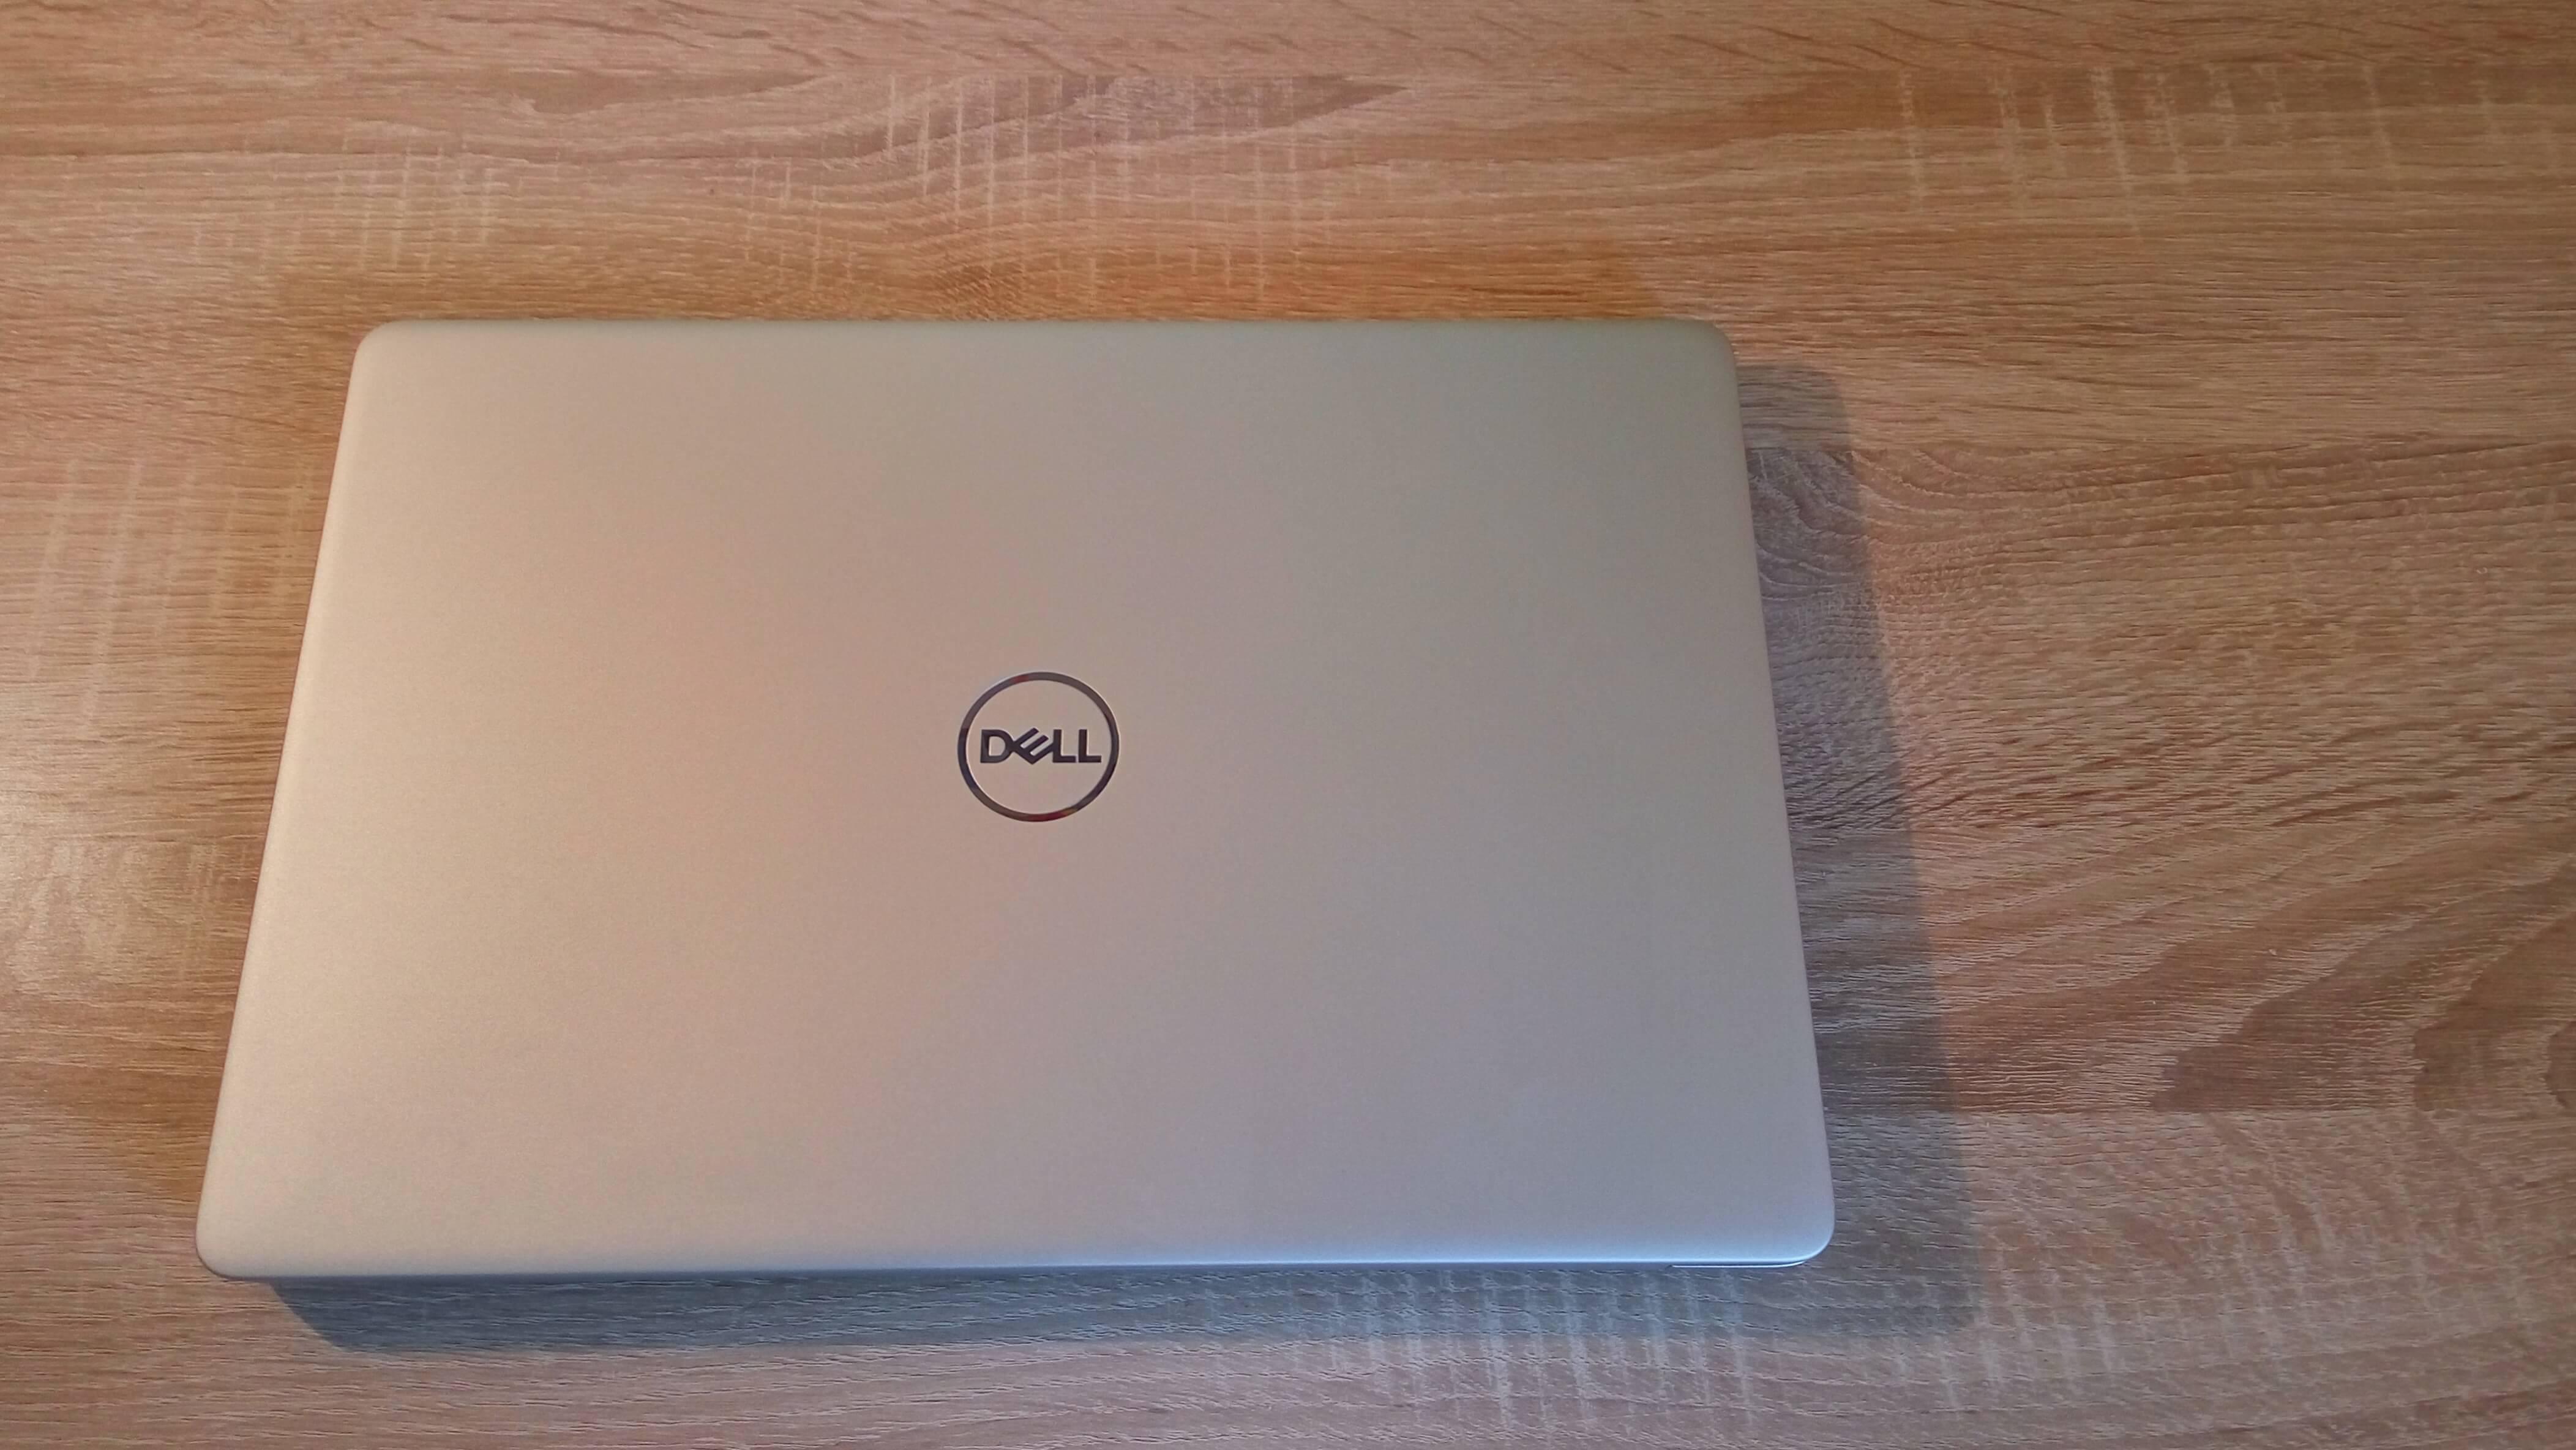 Dell Inspiron 5370 i3-7130U recenzja obudowa